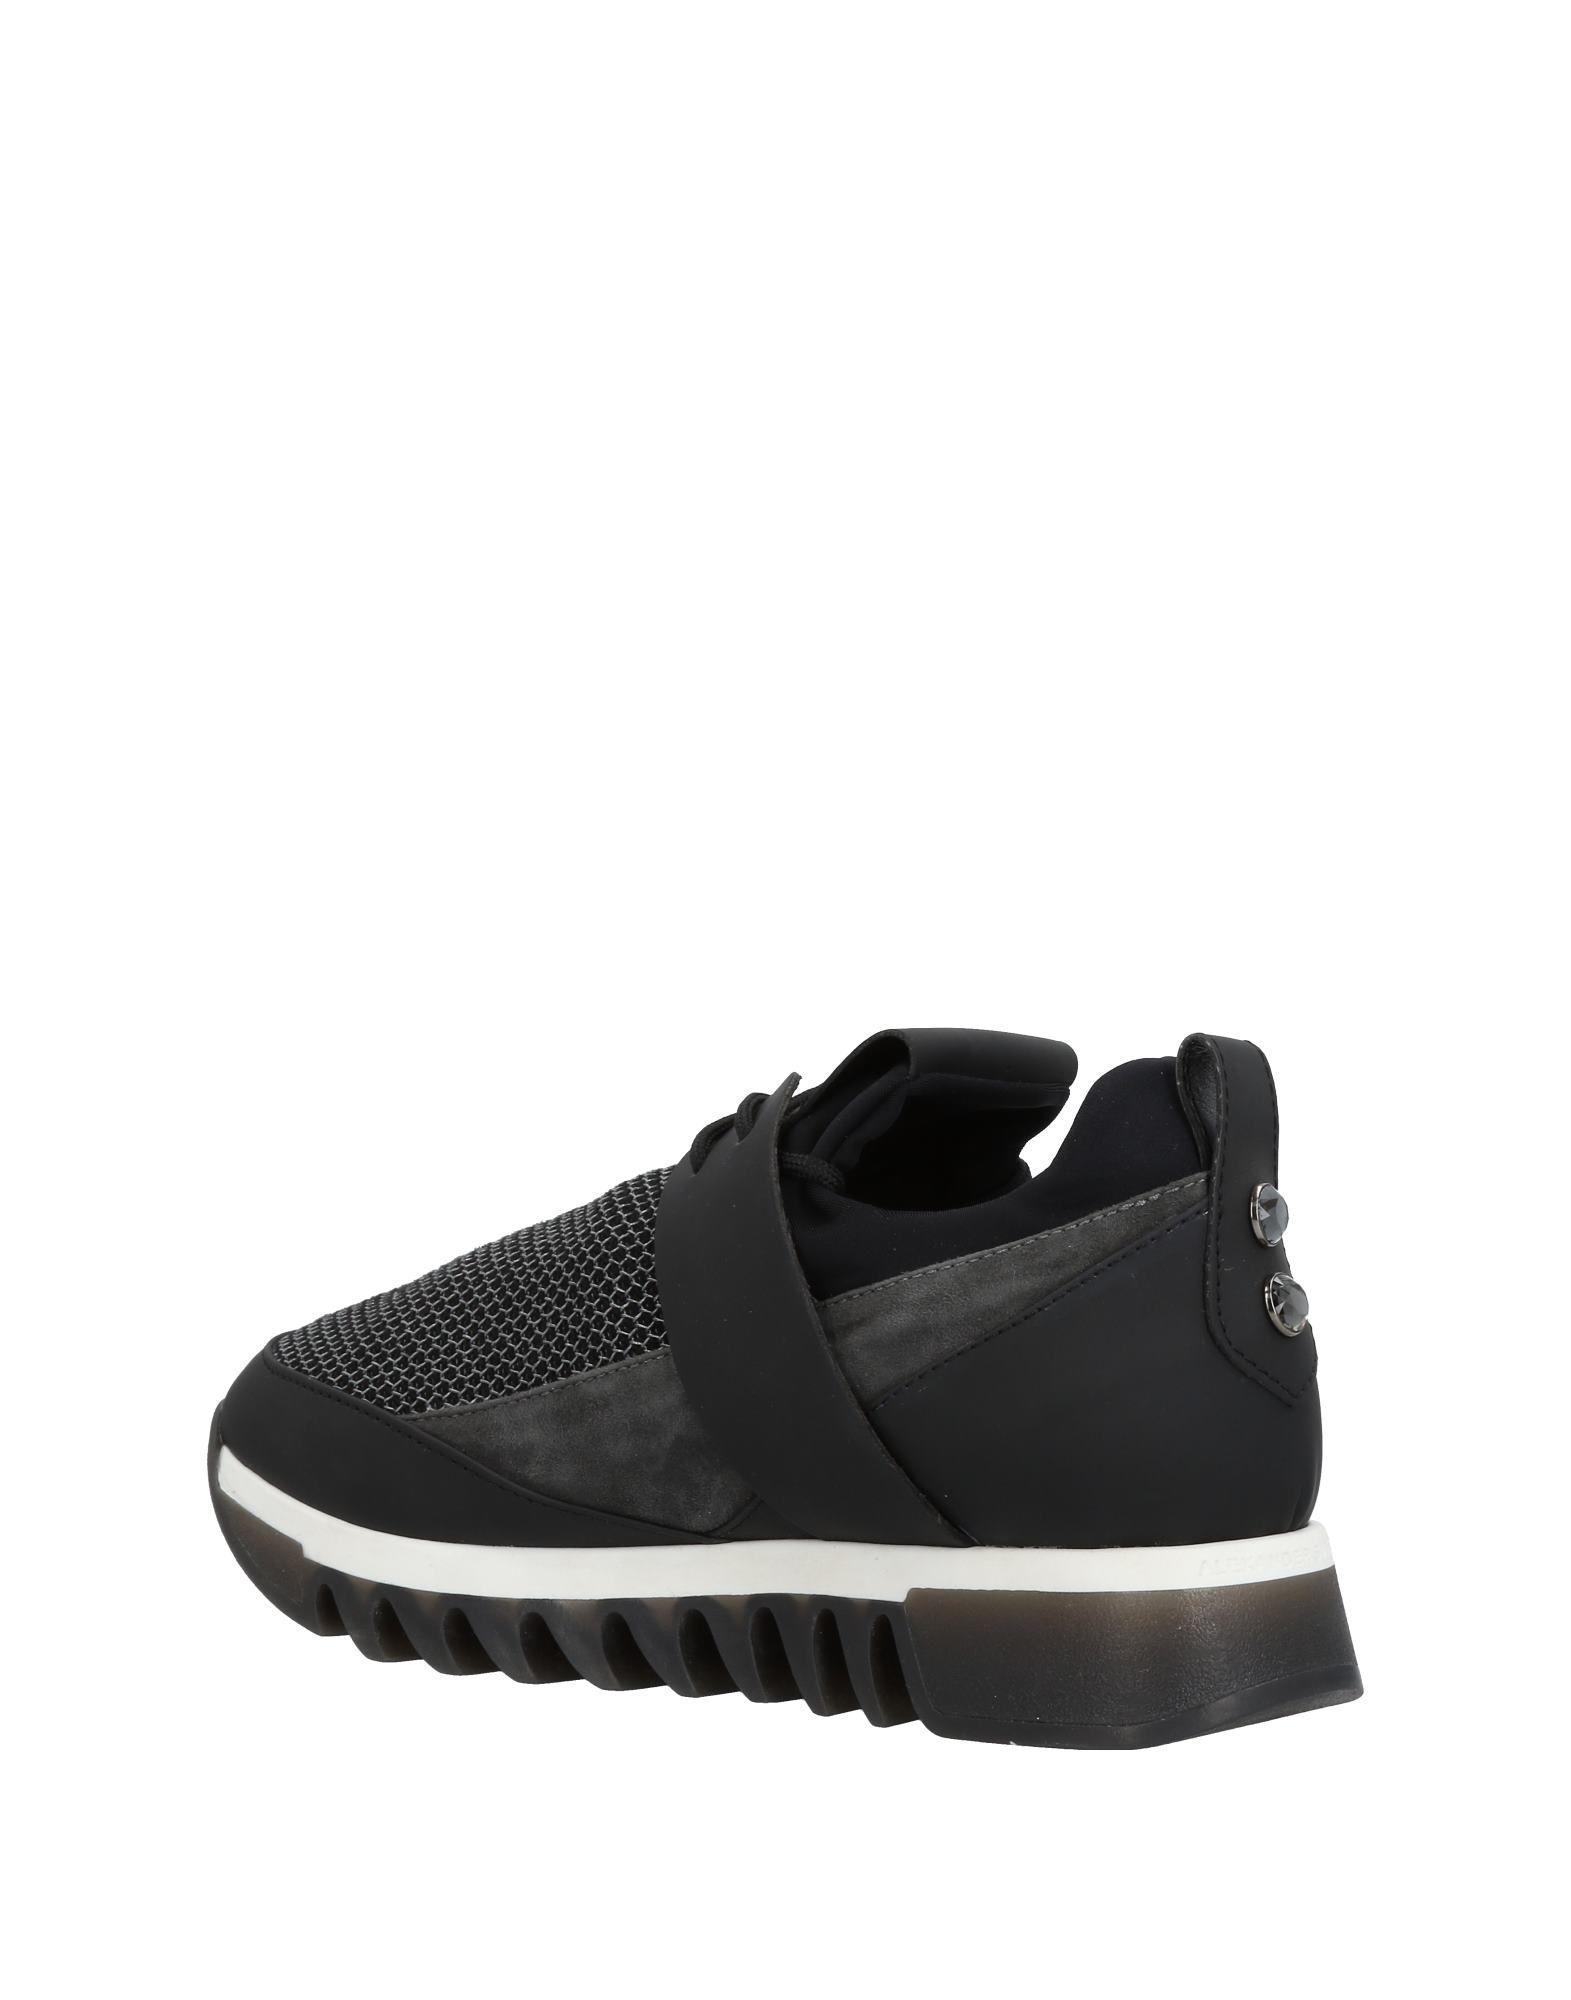 Gut um billige Sneakers Schuhe zu tragenAlexander Smith Sneakers billige Damen  11276549WV 77765a